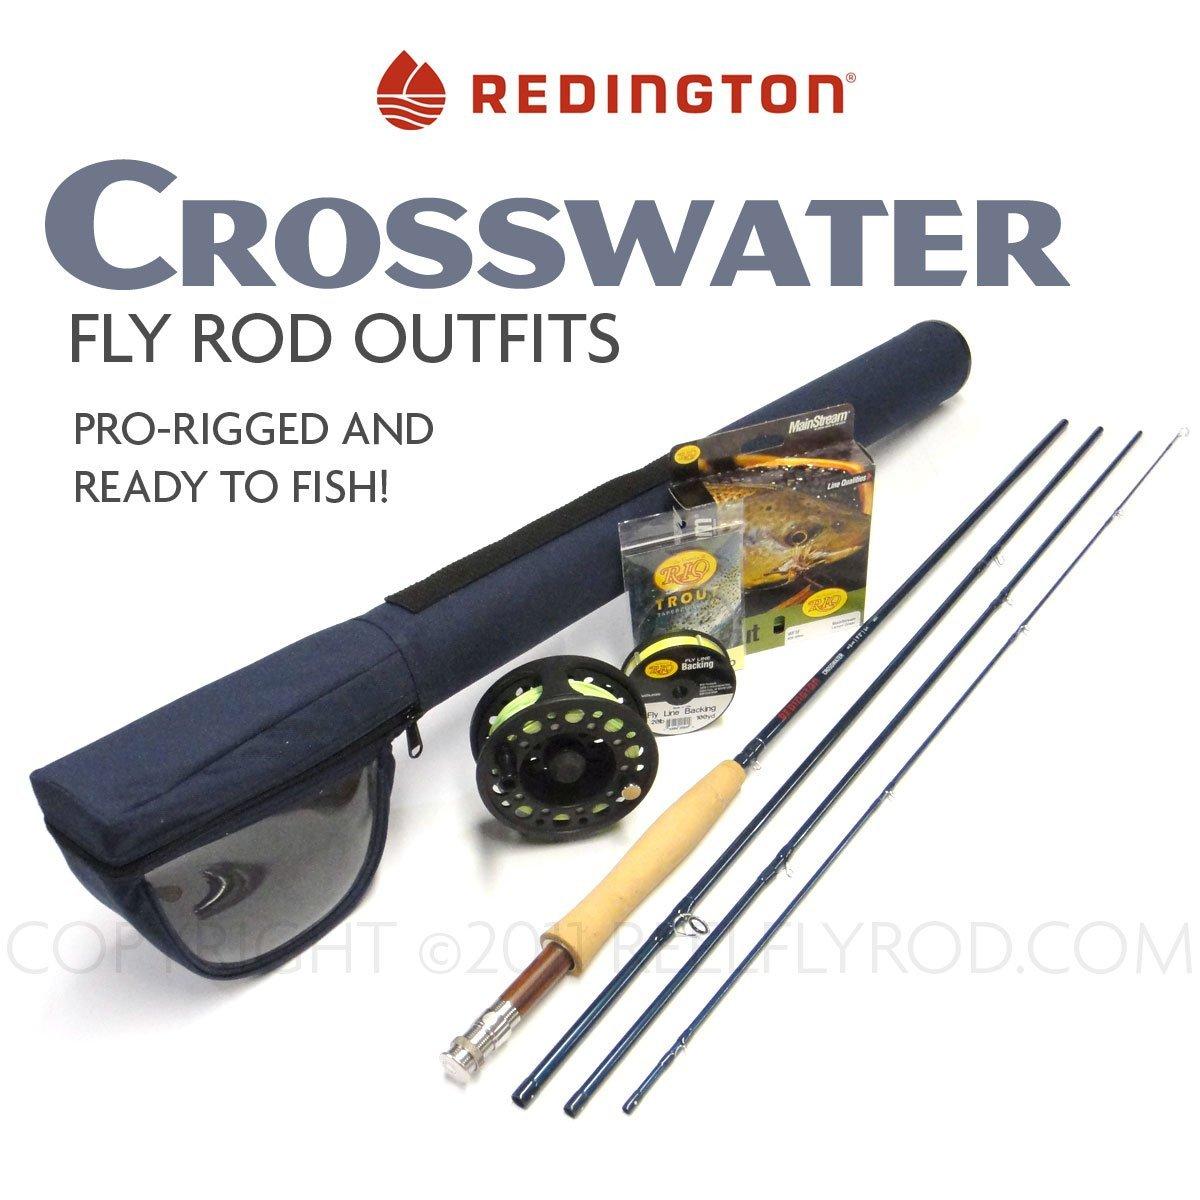 Redington crosswater complete fly rod and reel for Beginner fly fishing kit